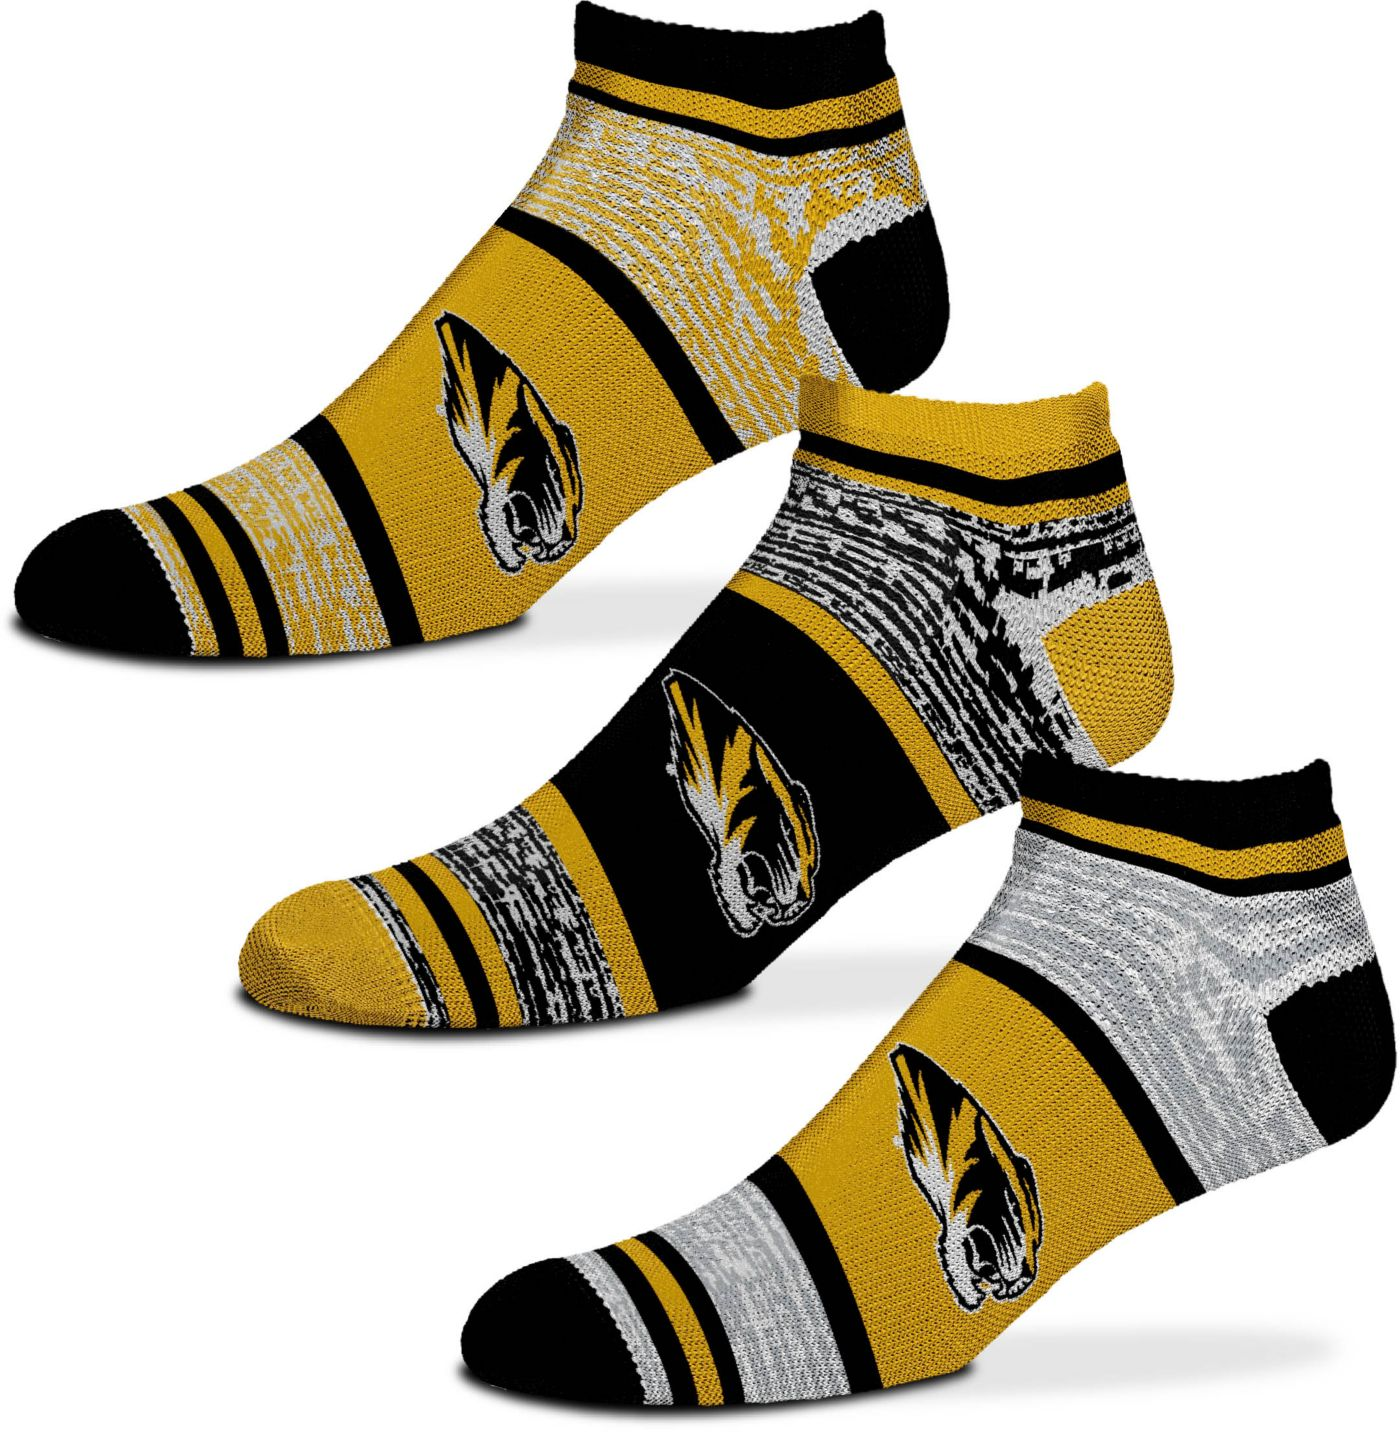 For Bare Feet Missouri Tigers 3 Pack Socks